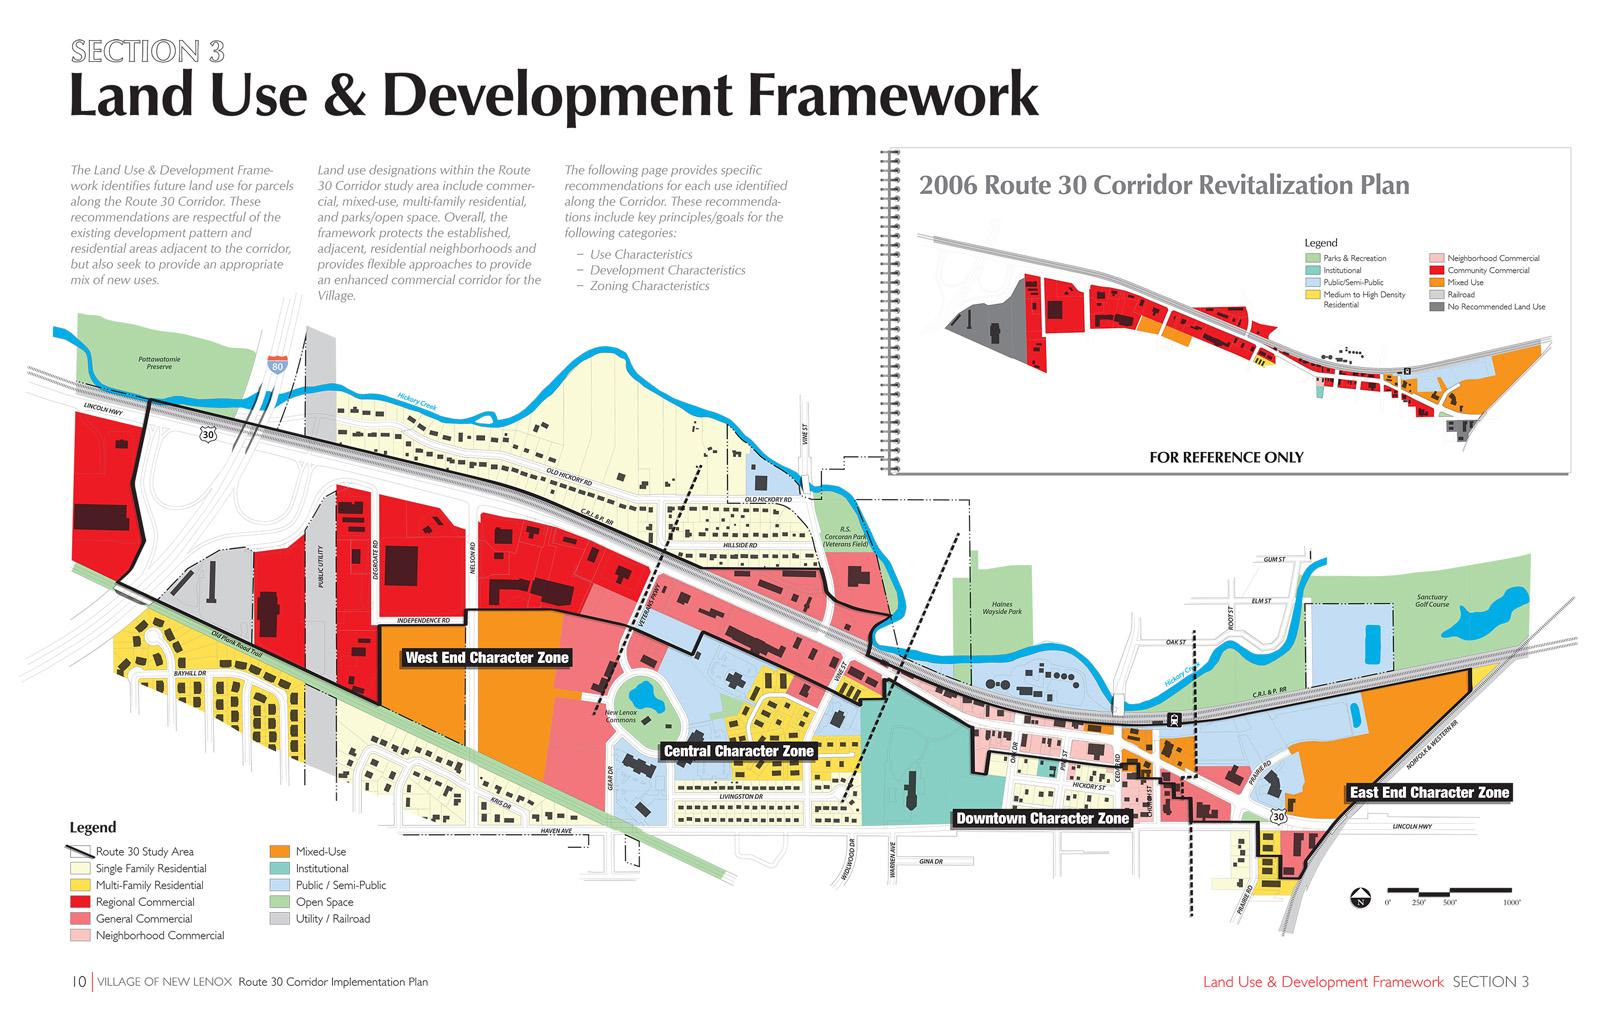 https://www.hlplanning.com/portals/wp-content/uploads/2014/10/Route-30-Corridor-Implementation-Plan-16.jpg